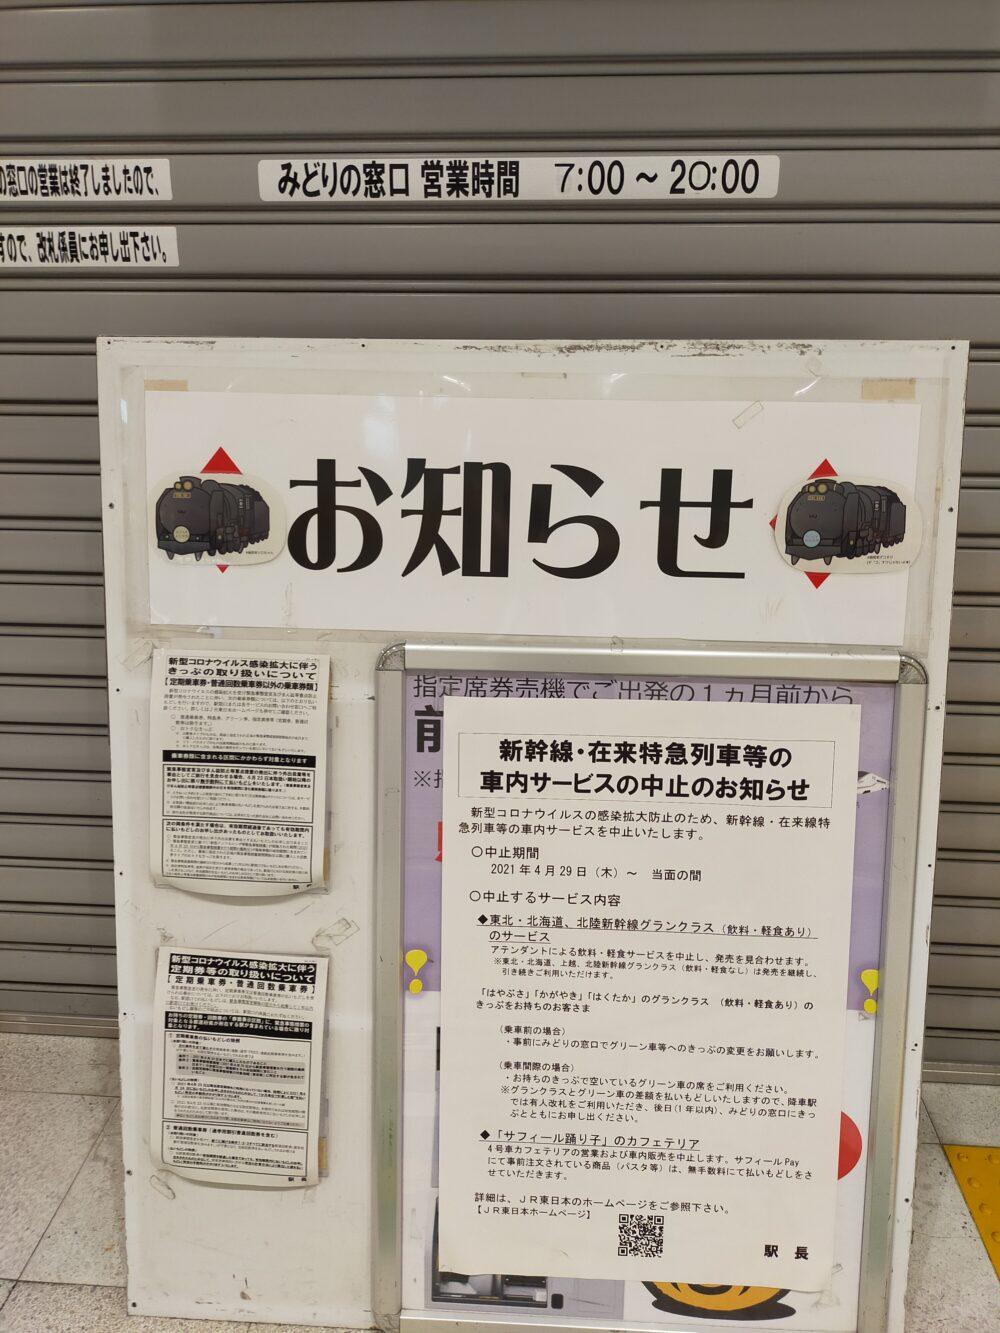 JR高崎駅のみどりの窓口営業時間